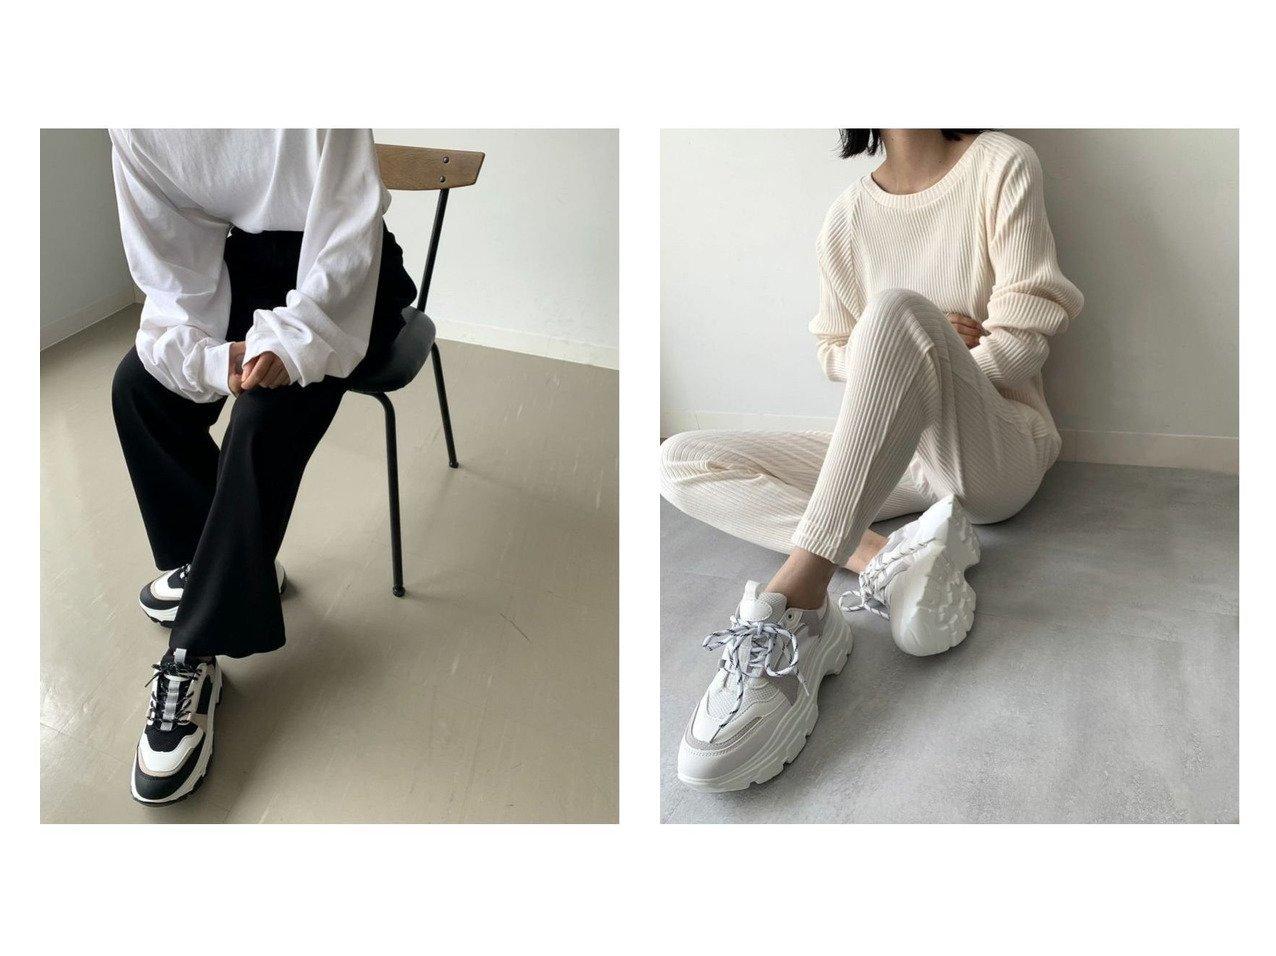 【via j/ヴィアジェイ】のVia j(ヴィアジェイ) newダッドスニーカー シューズ・靴のおすすめ!人気、トレンド・レディースファッションの通販  おすすめで人気の流行・トレンド、ファッションの通販商品 メンズファッション・キッズファッション・インテリア・家具・レディースファッション・服の通販 founy(ファニー) https://founy.com/ ファッション Fashion レディースファッション WOMEN シューズ スニーカー スリッポン 再入荷 Restock/Back in Stock/Re Arrival |ID:crp329100000024521